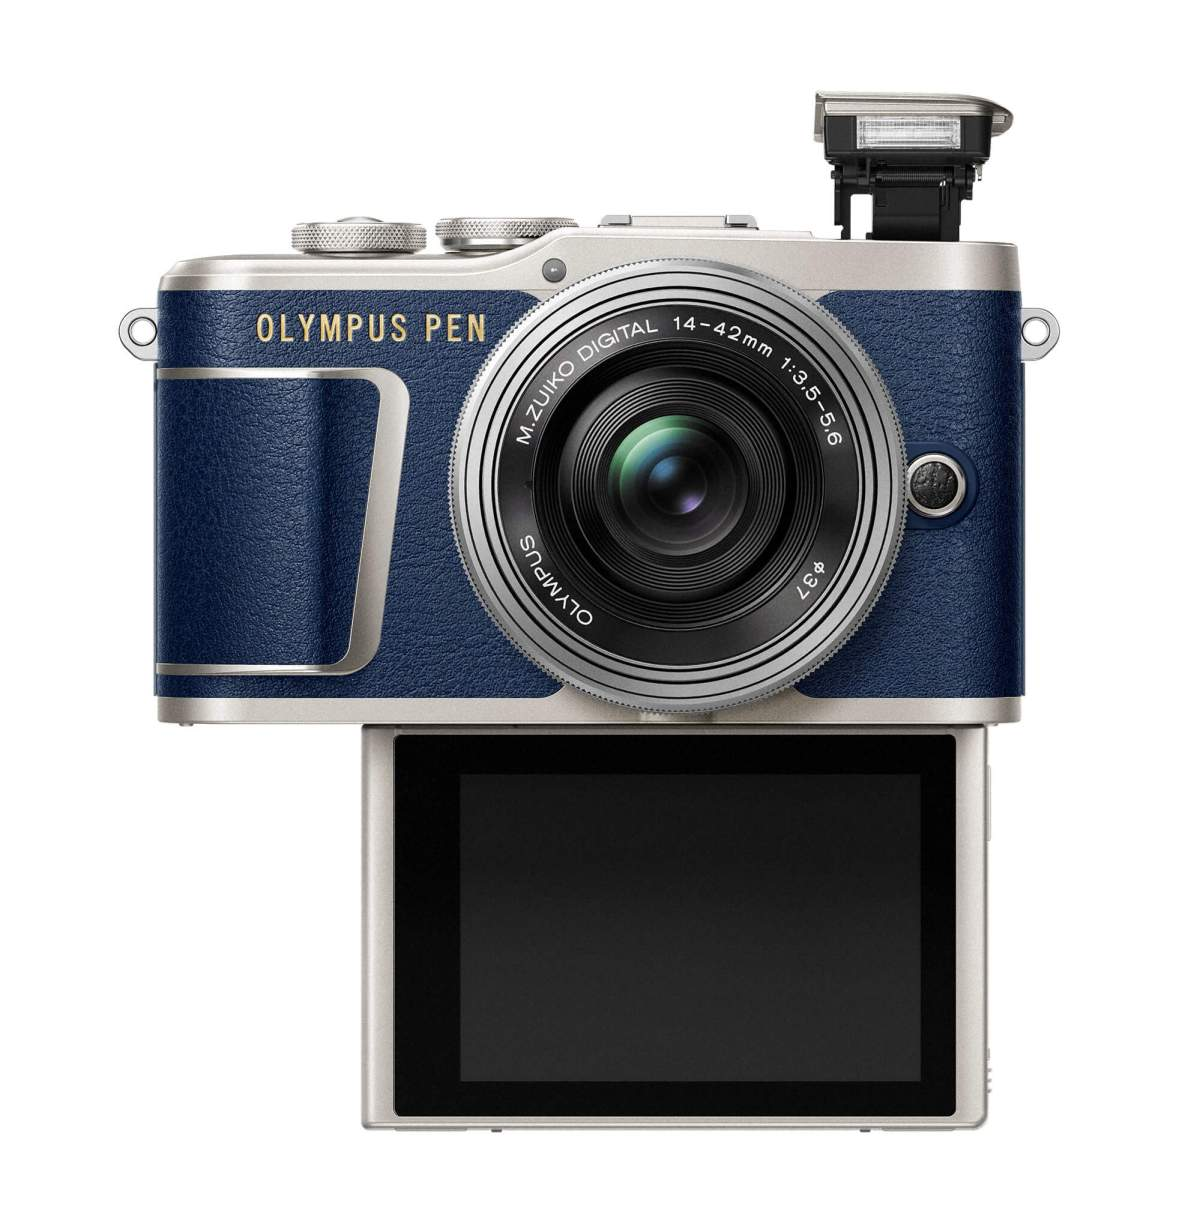 Olympus Pen E-PL9 สีน้ำเงิน Denim เฉพาะที่ BIG CAMERA เท่านั้น 14 - camera